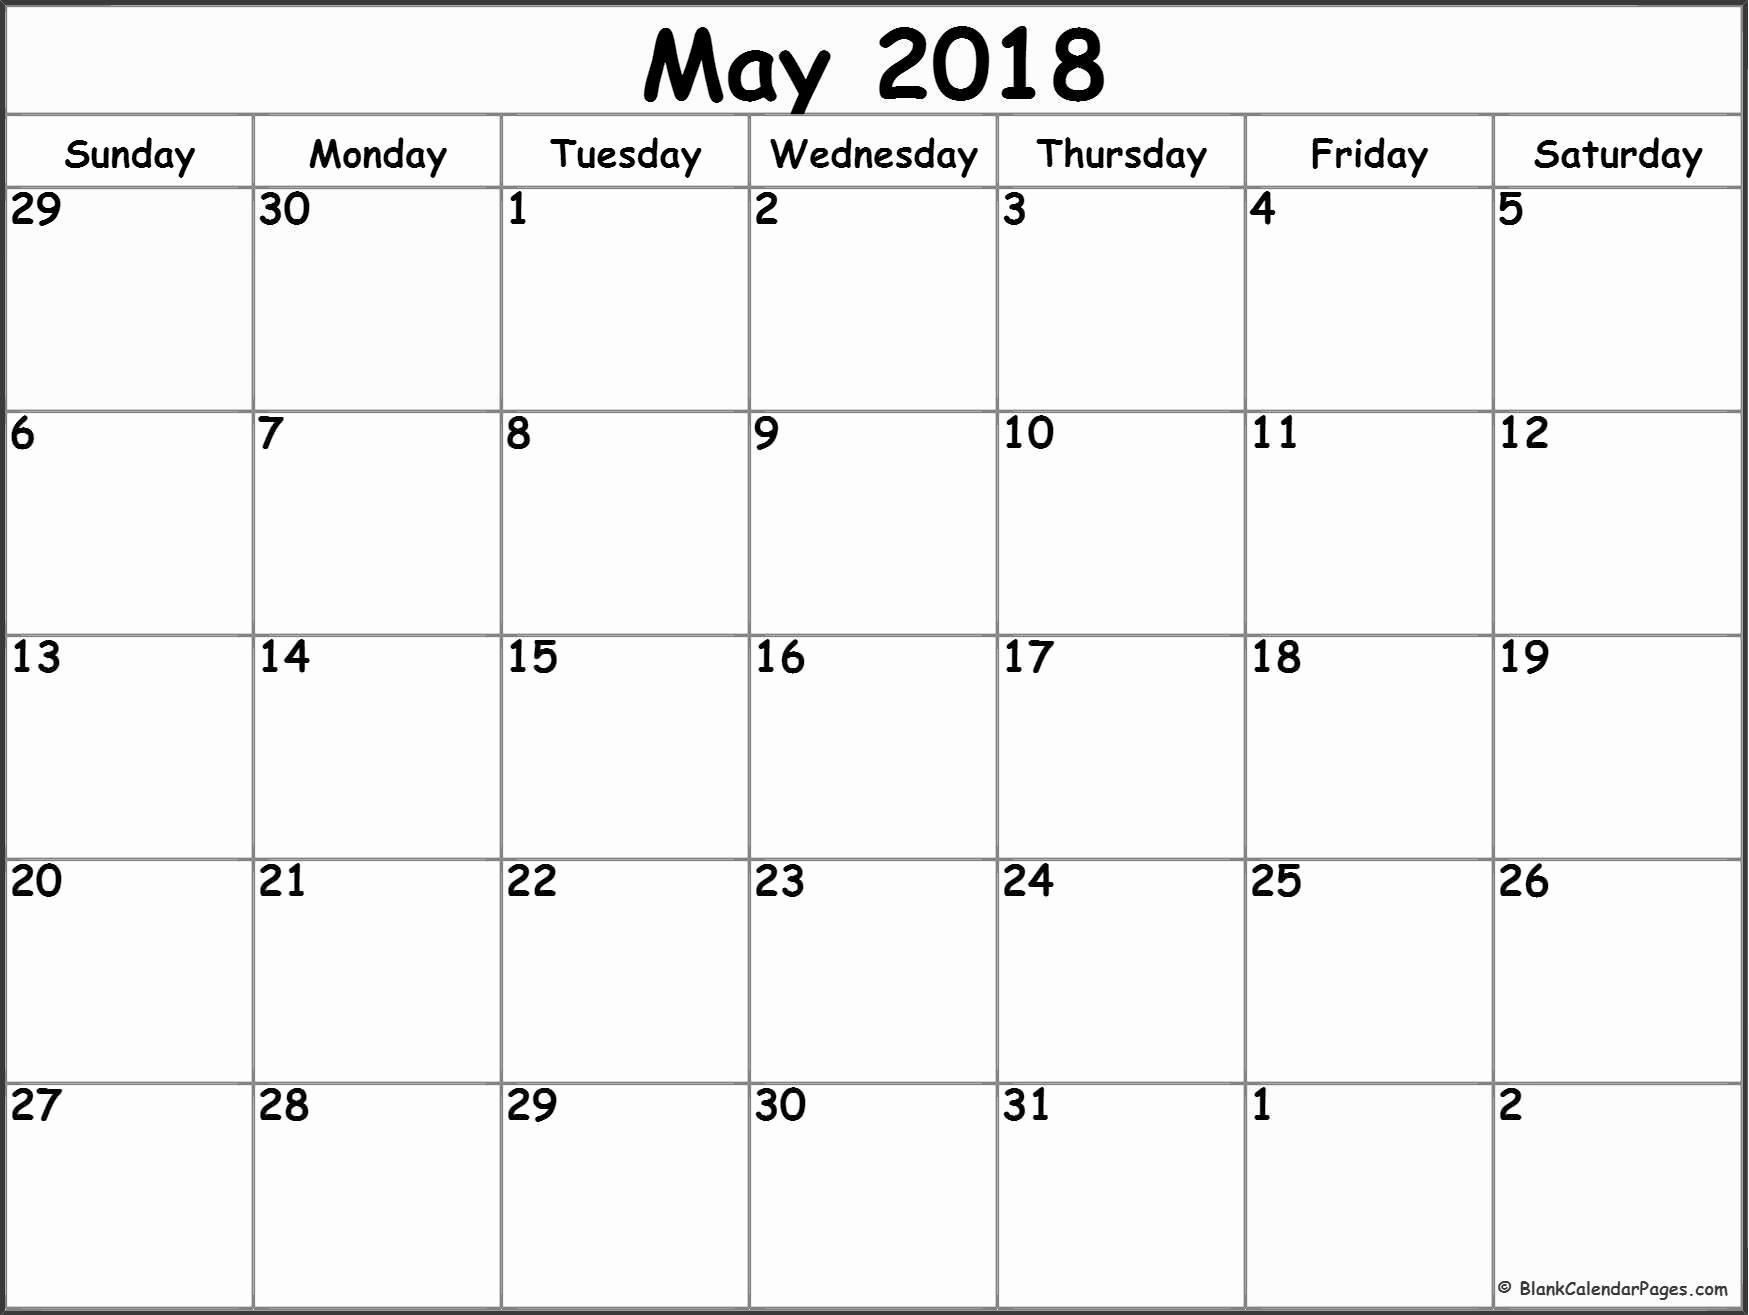 Blank May 2018 Calendar Printable Unique May 2018 Blank Calendar Collection